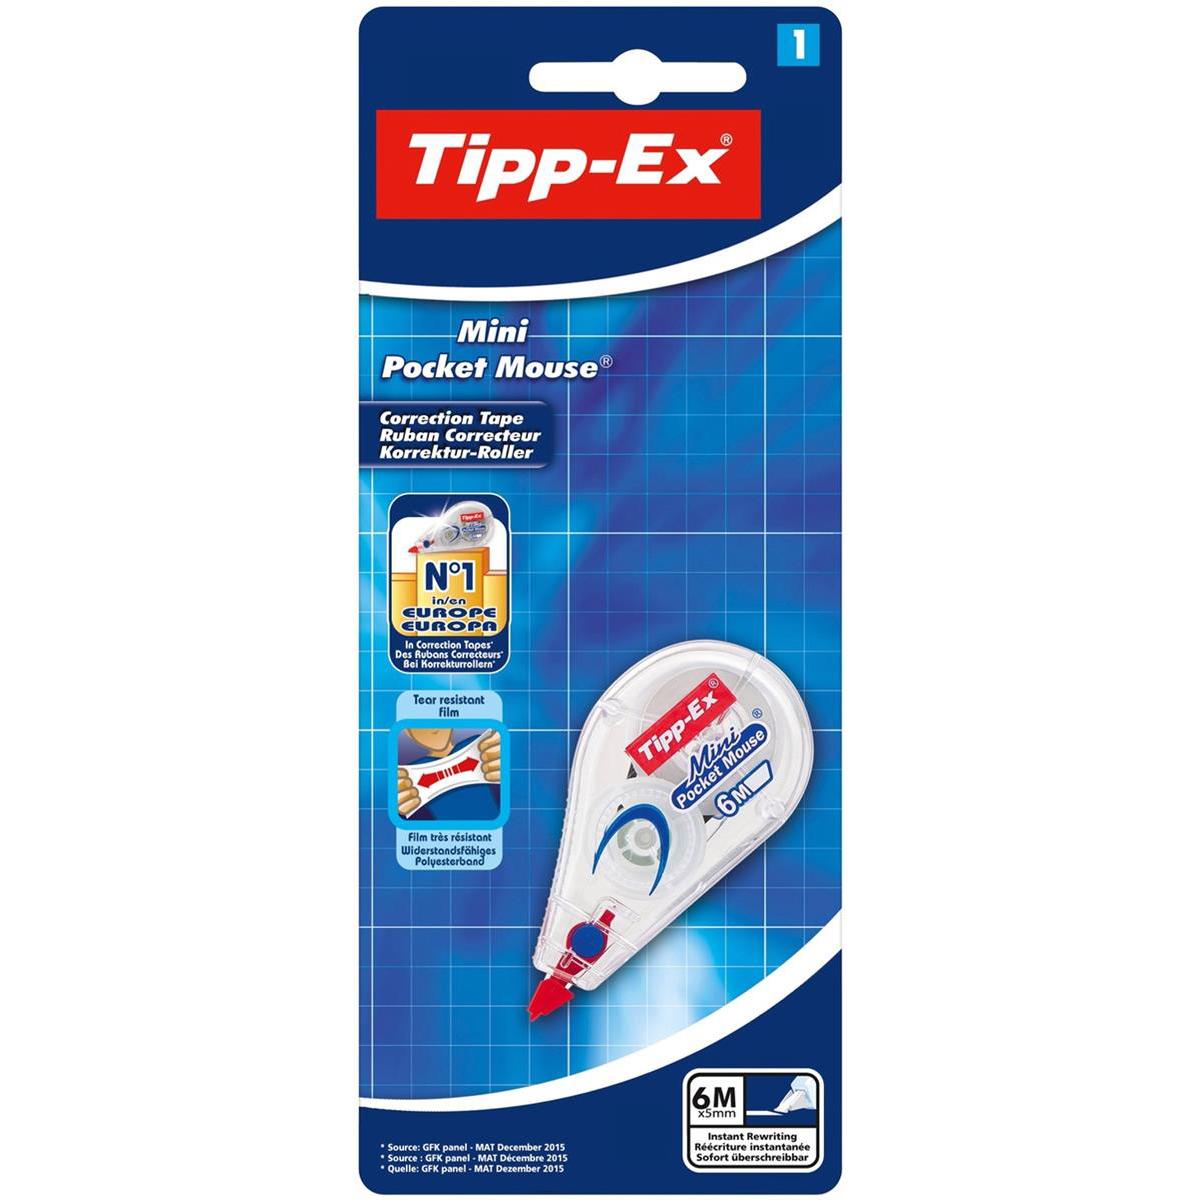 Tipp-Ex Mini Pocket Mouse 6mx5mm Ref 932564 [Pack 10] [3 for 2] Jan-Mar 2020